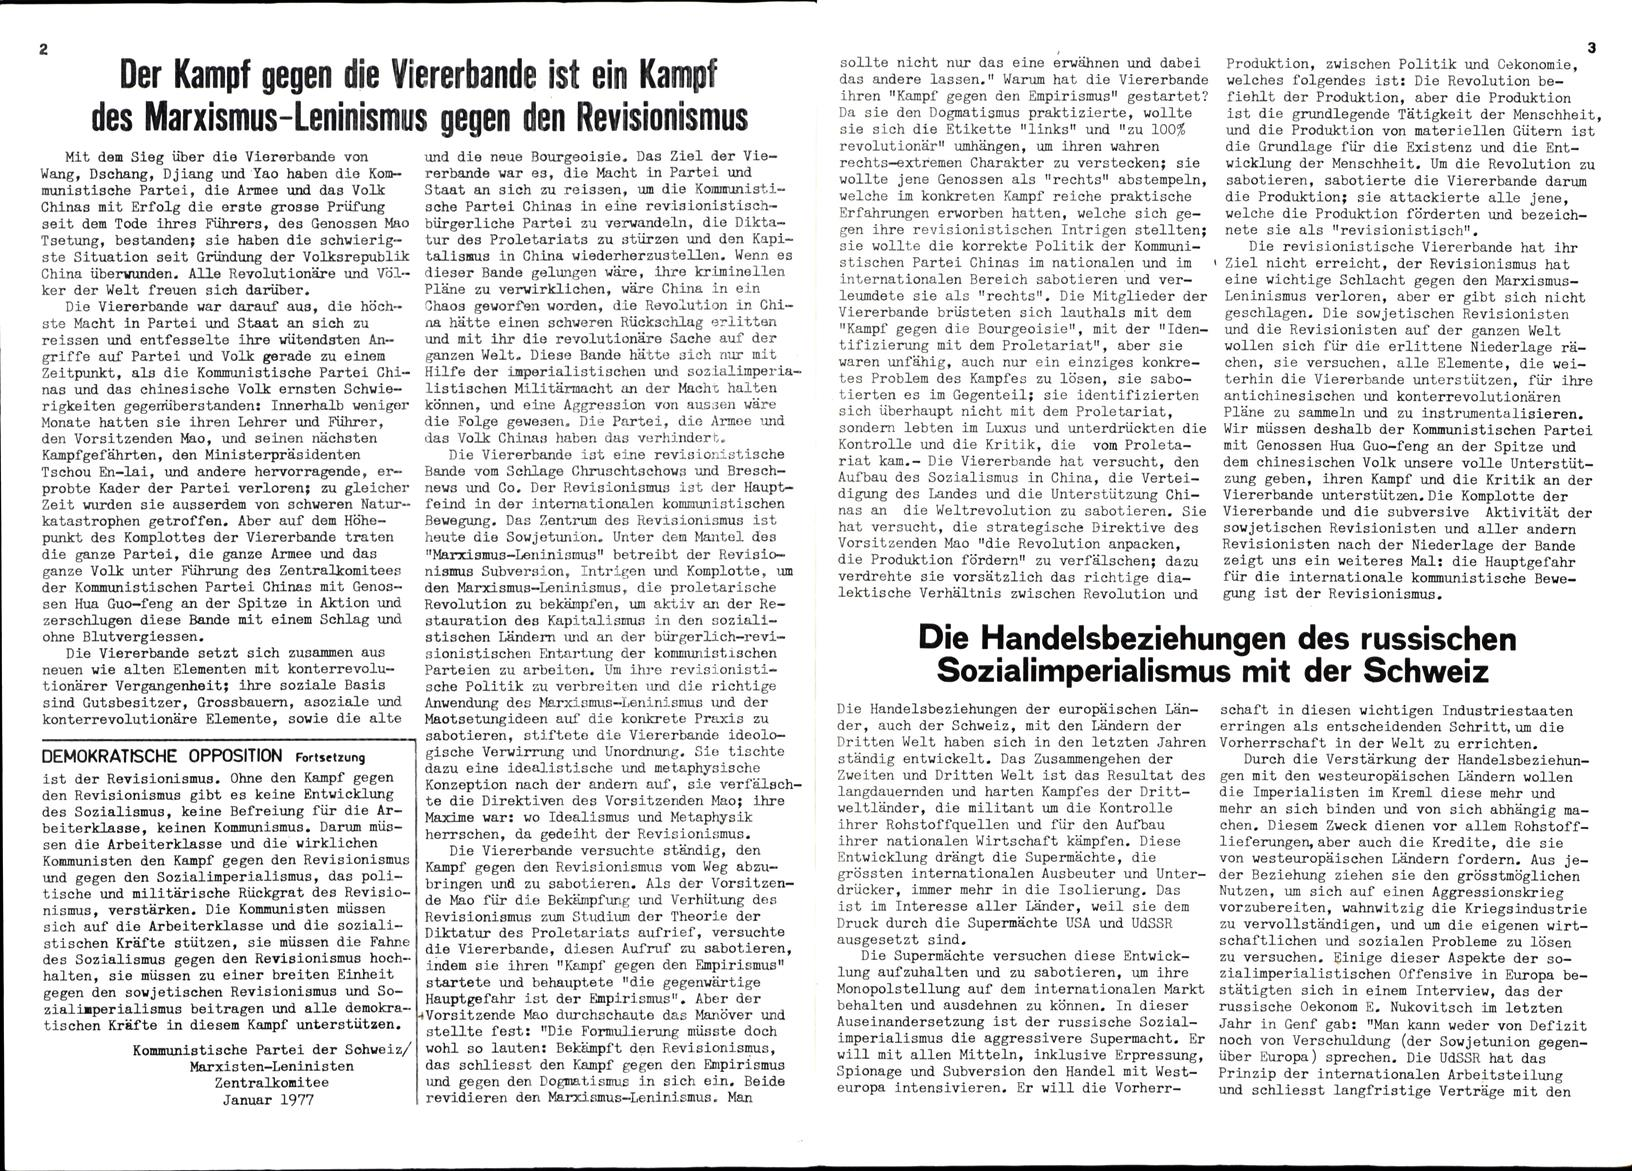 Schweiz_KPSML_Oktober_19770300_108_002